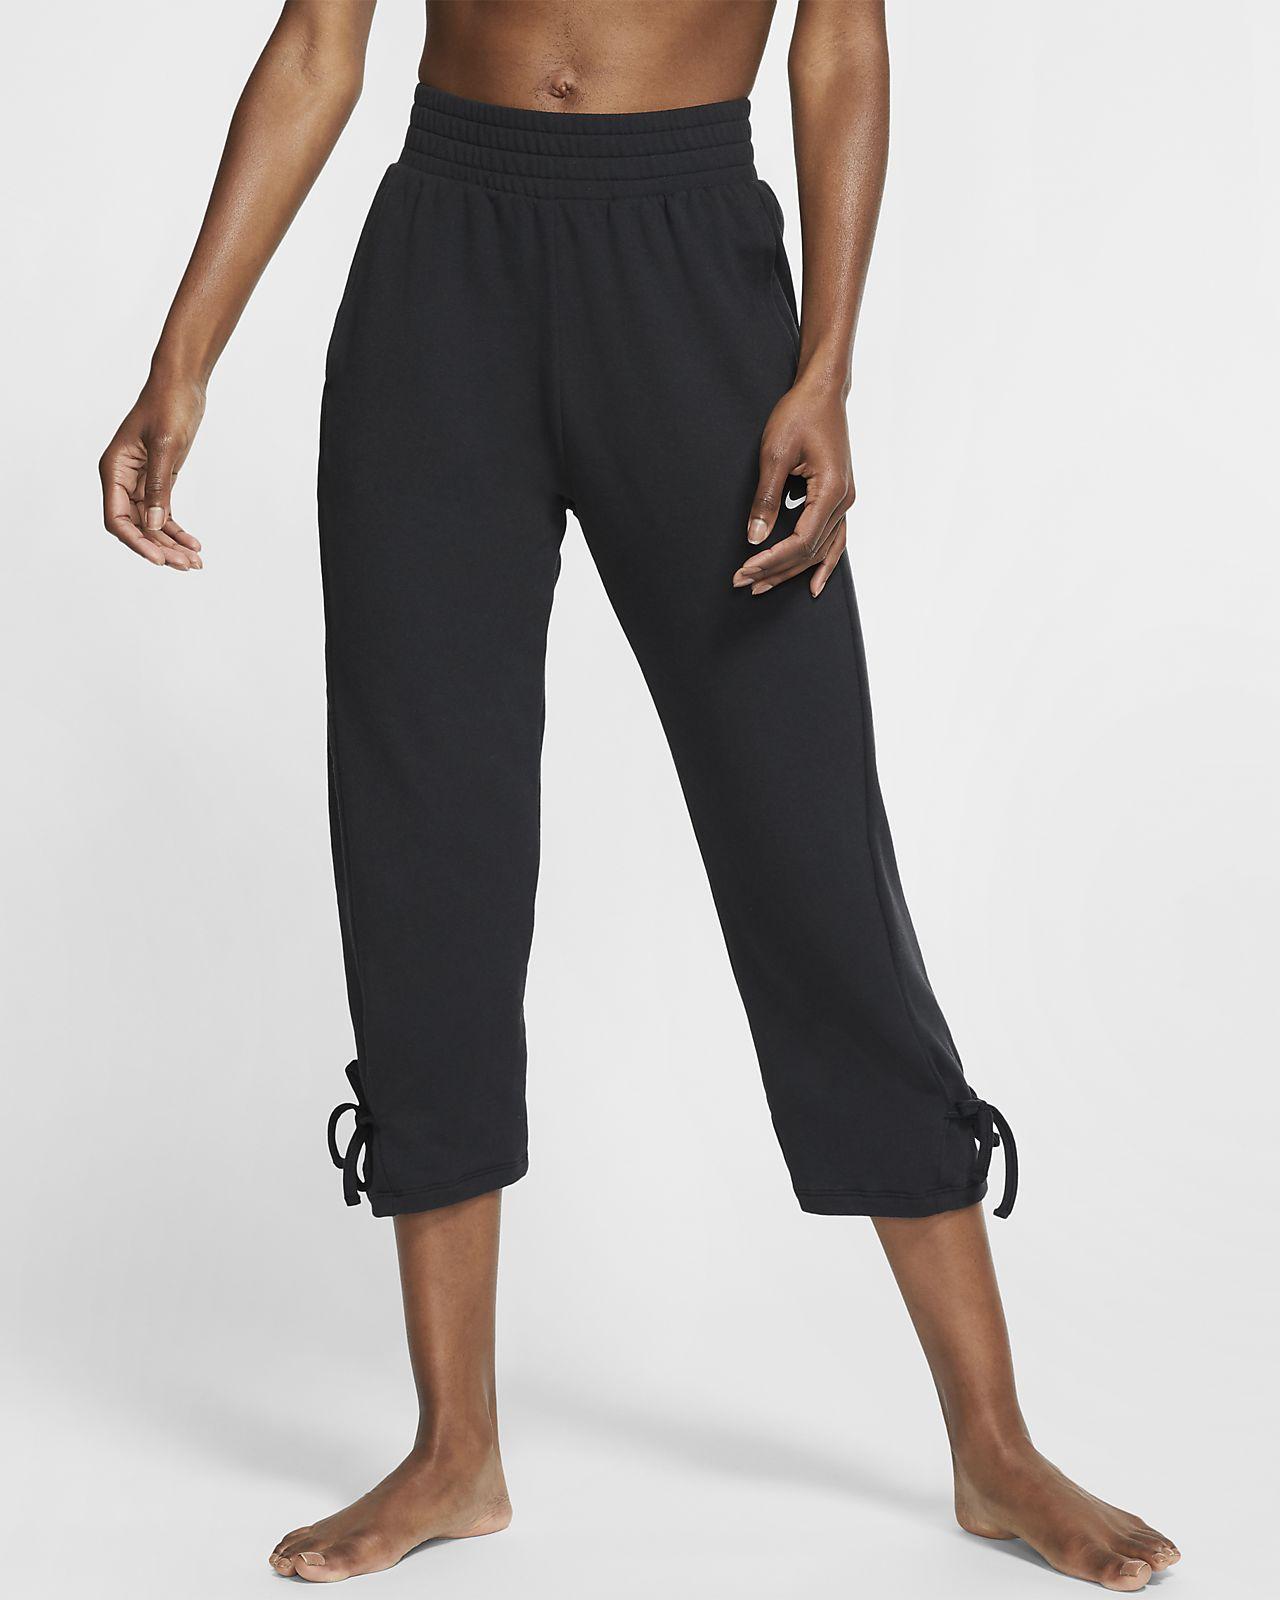 Nike Yoga Women's Cropped Pants